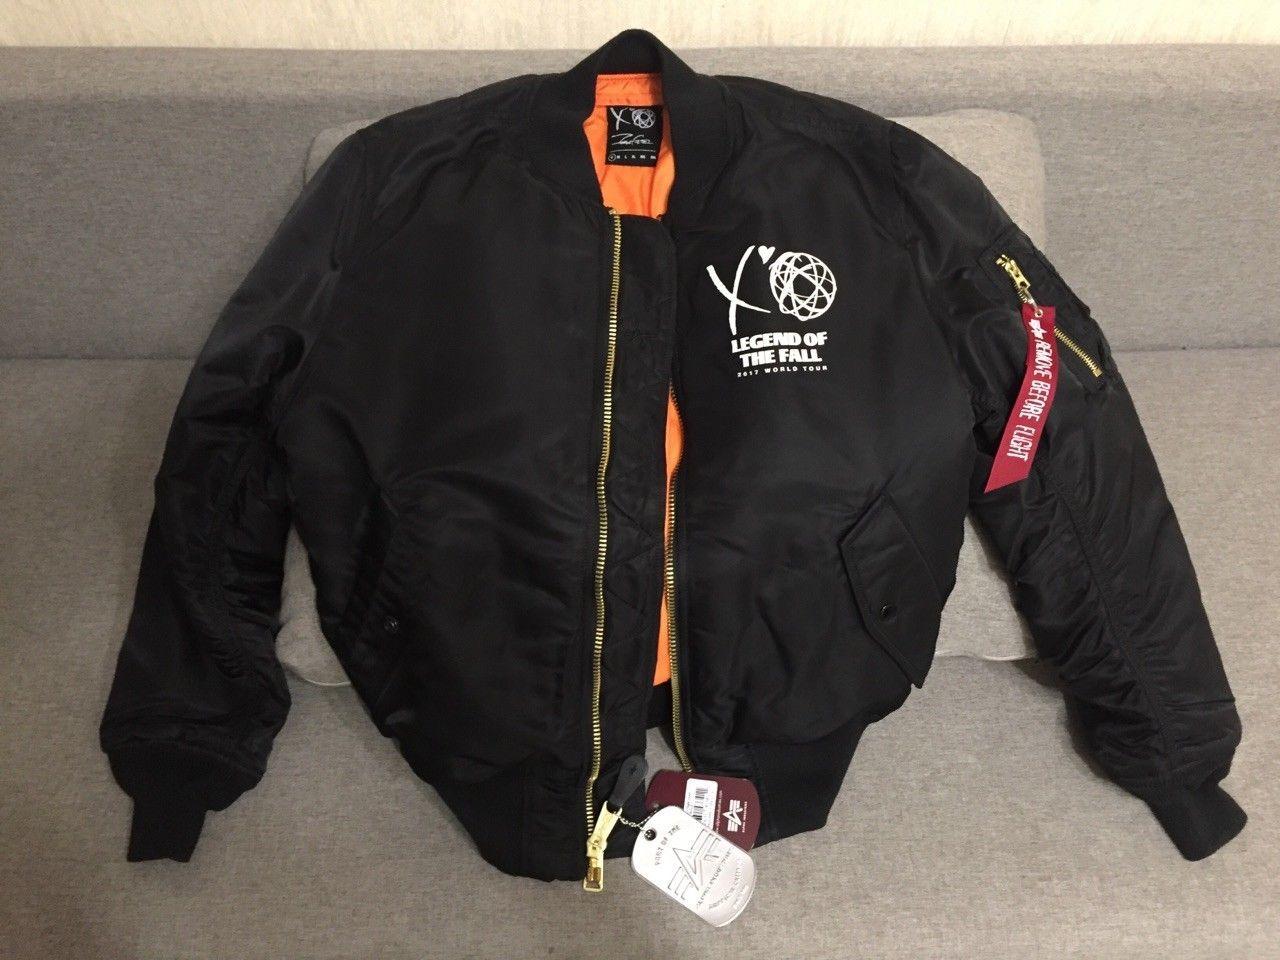 The Weeknd X Futura 2000 Ma 1 Design Bomber Ebay Link Bomber Bomber Jacket Design [ 960 x 1280 Pixel ]